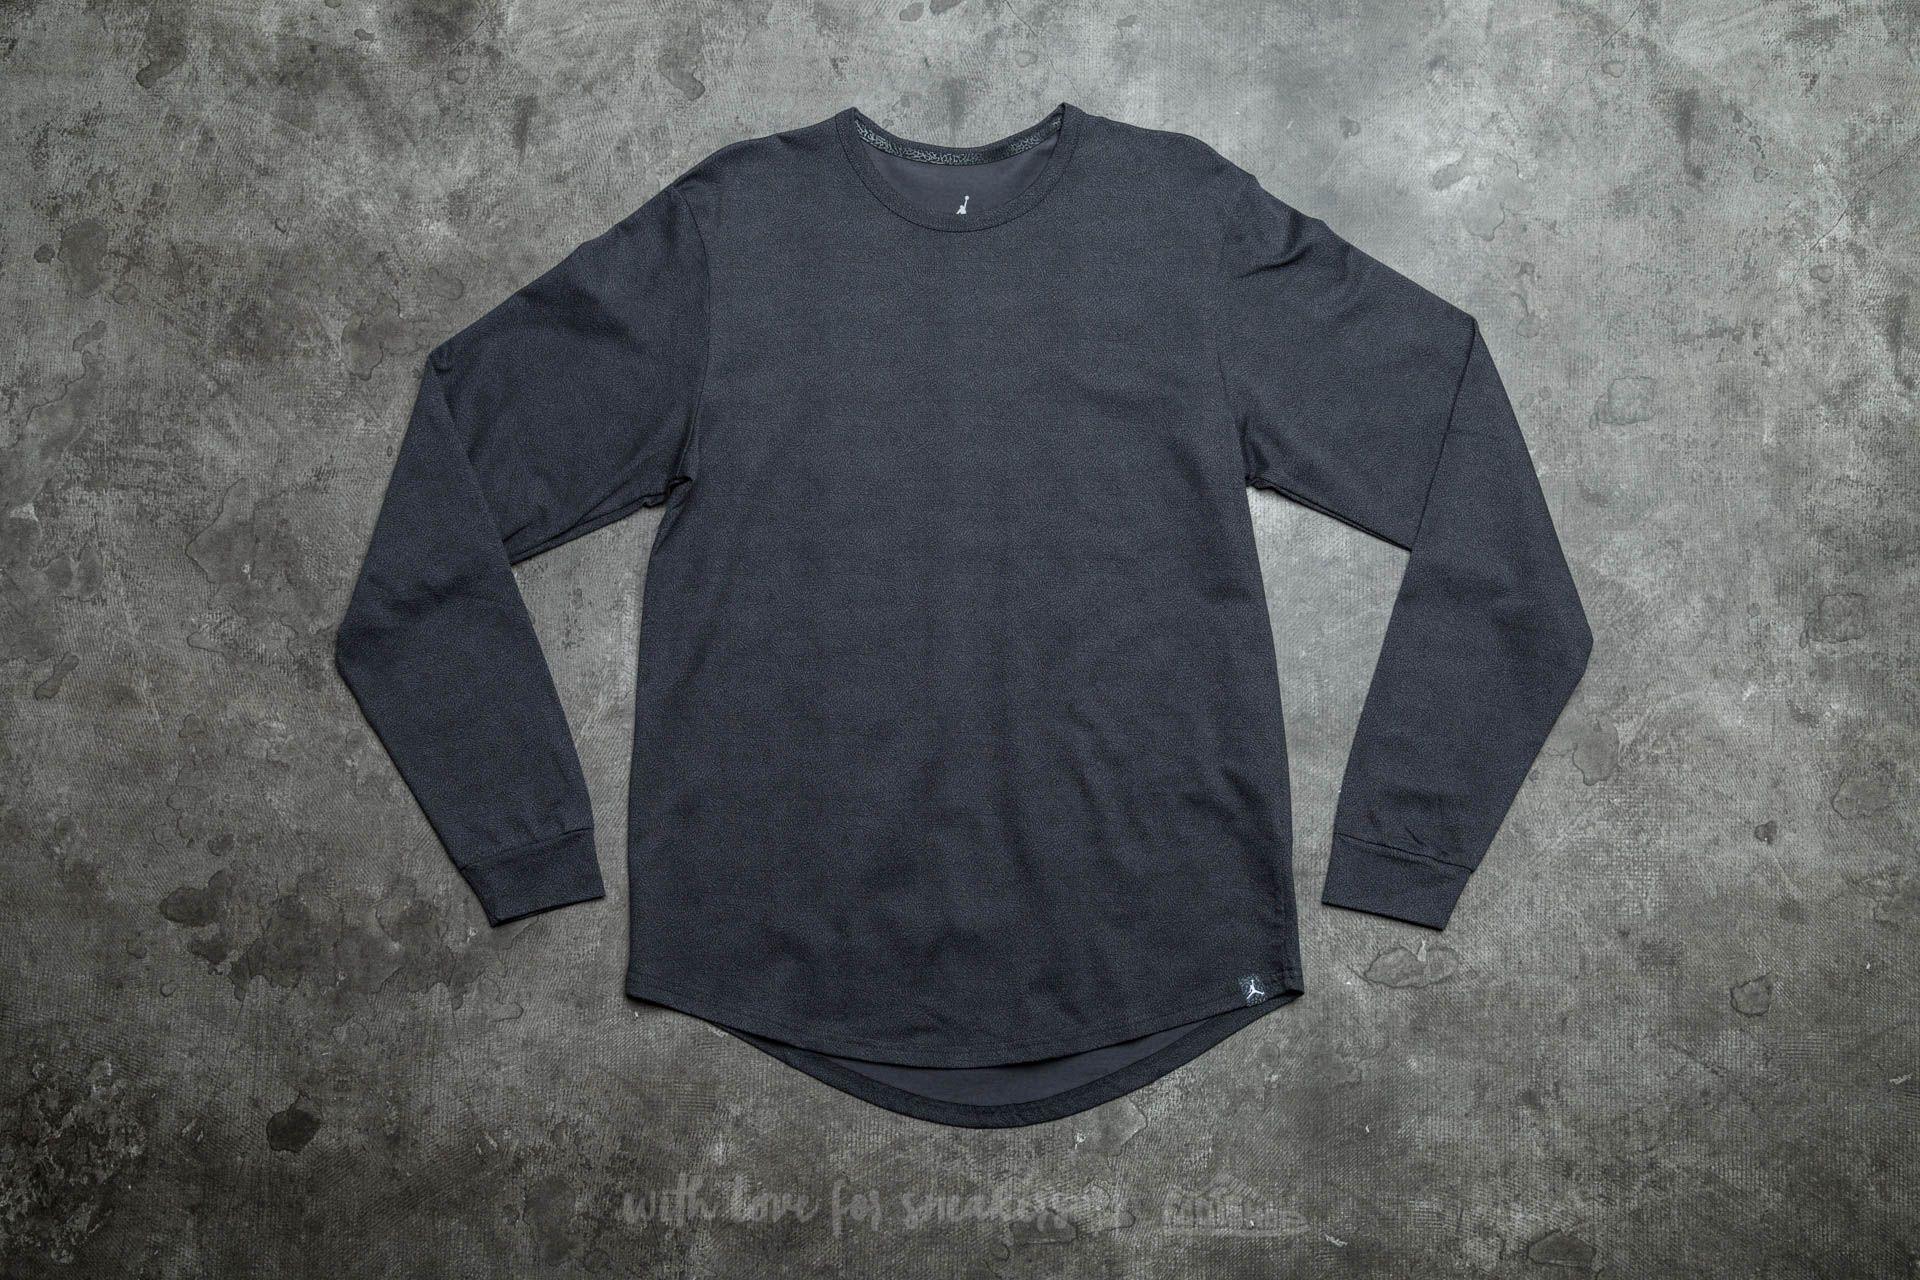 6525466ebc Jordan 23 True Elephant Print Long Sleeve Tee Anthracite | Footshop